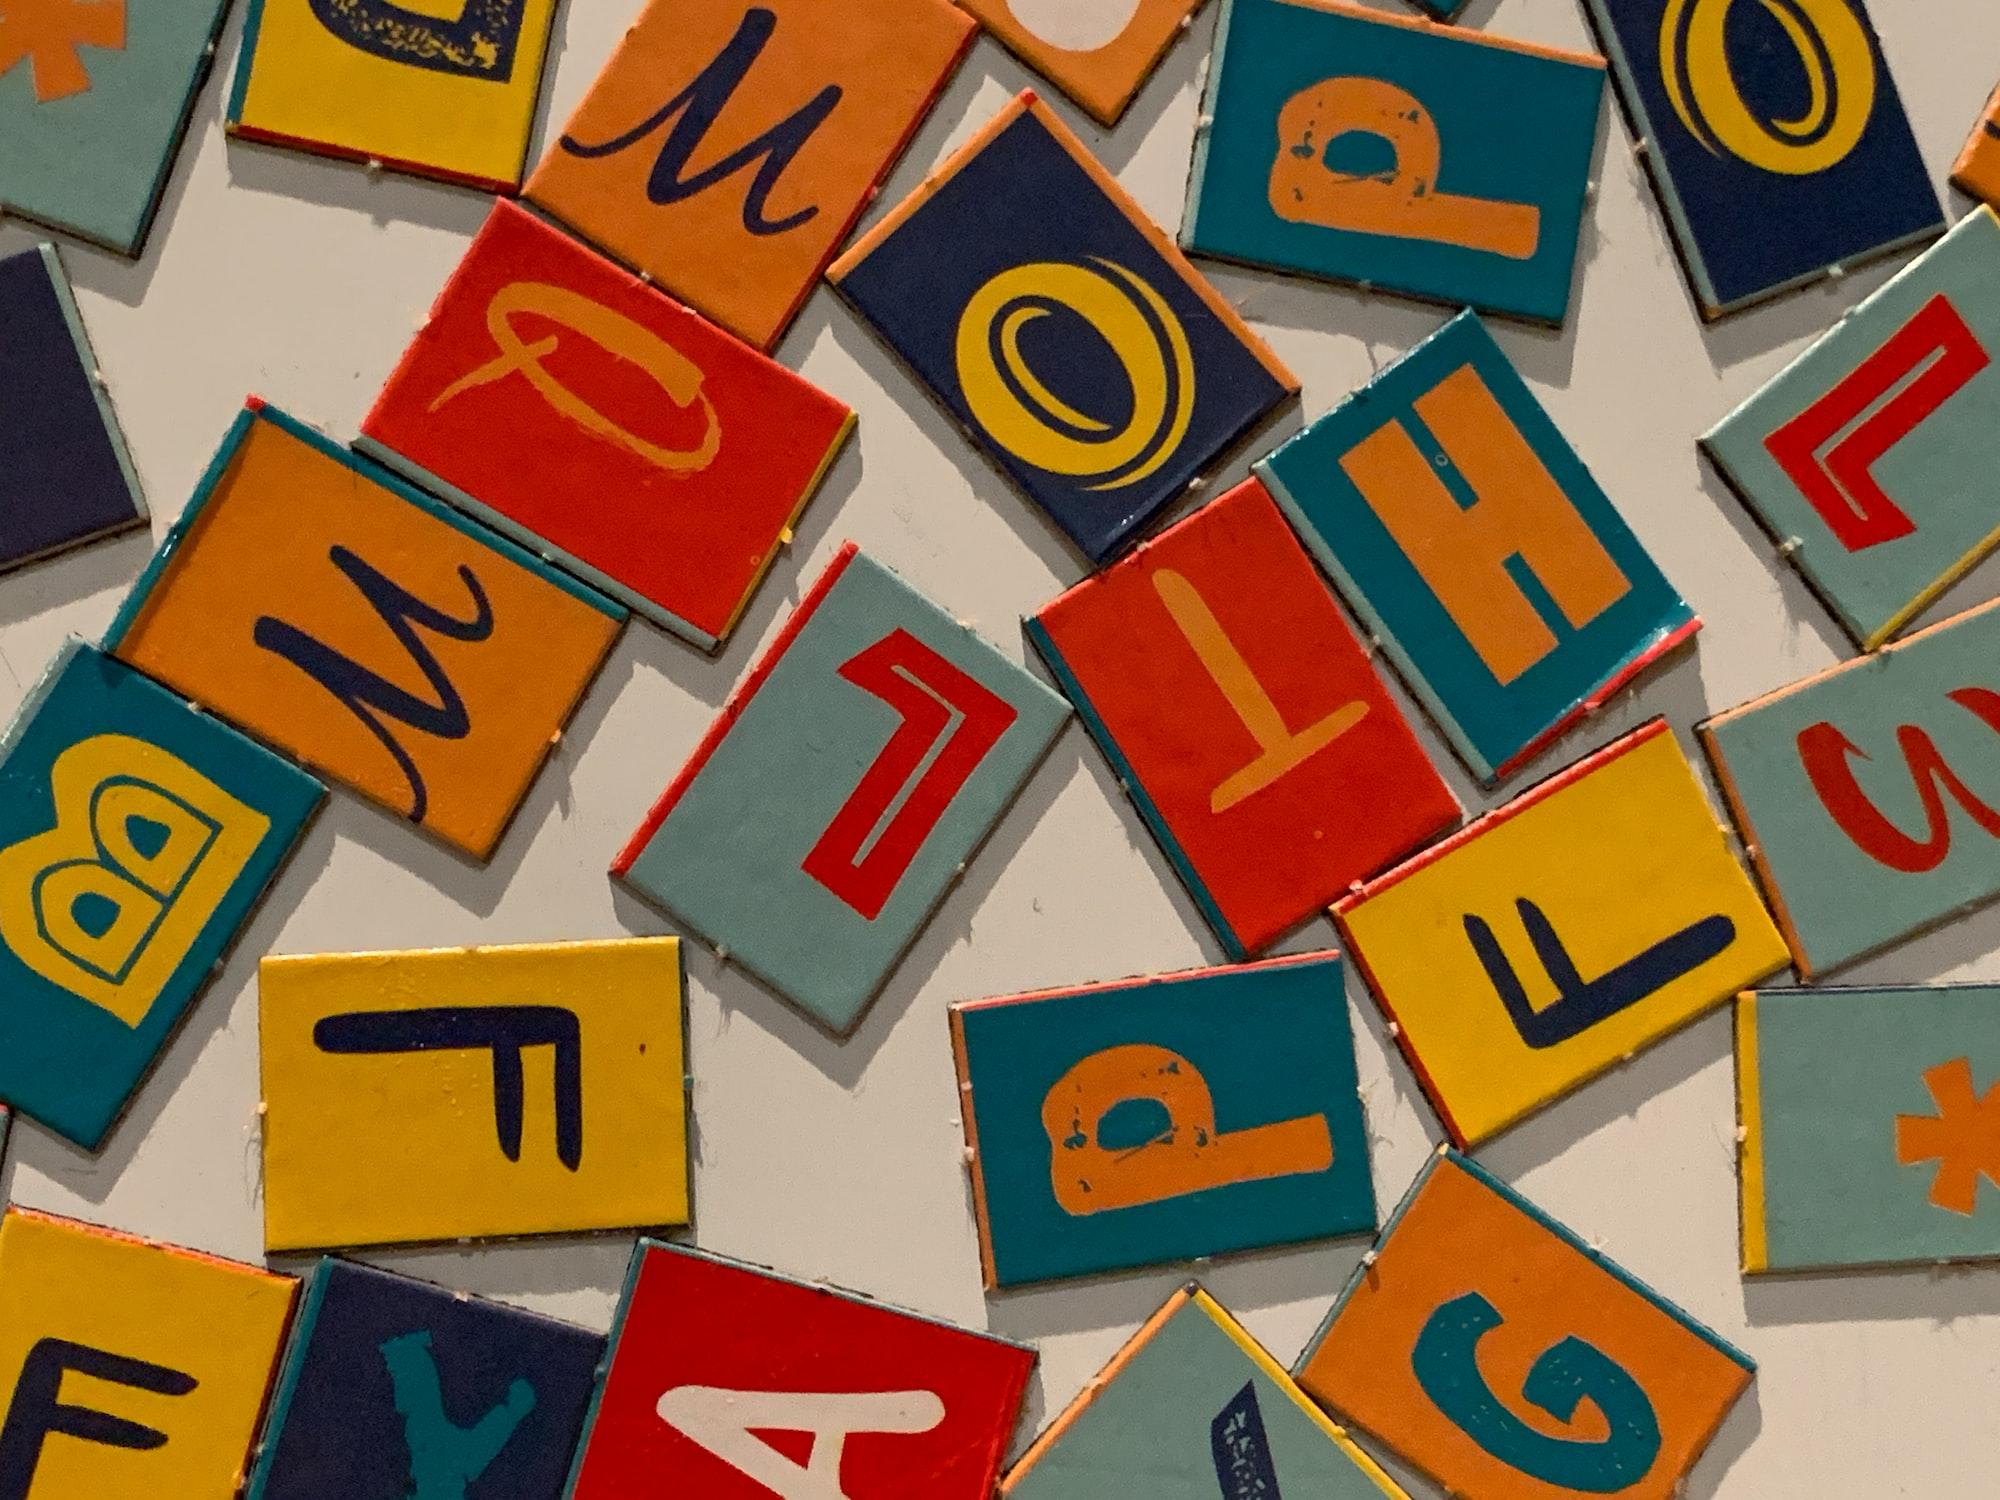 Arabic vs Roman Alphabets